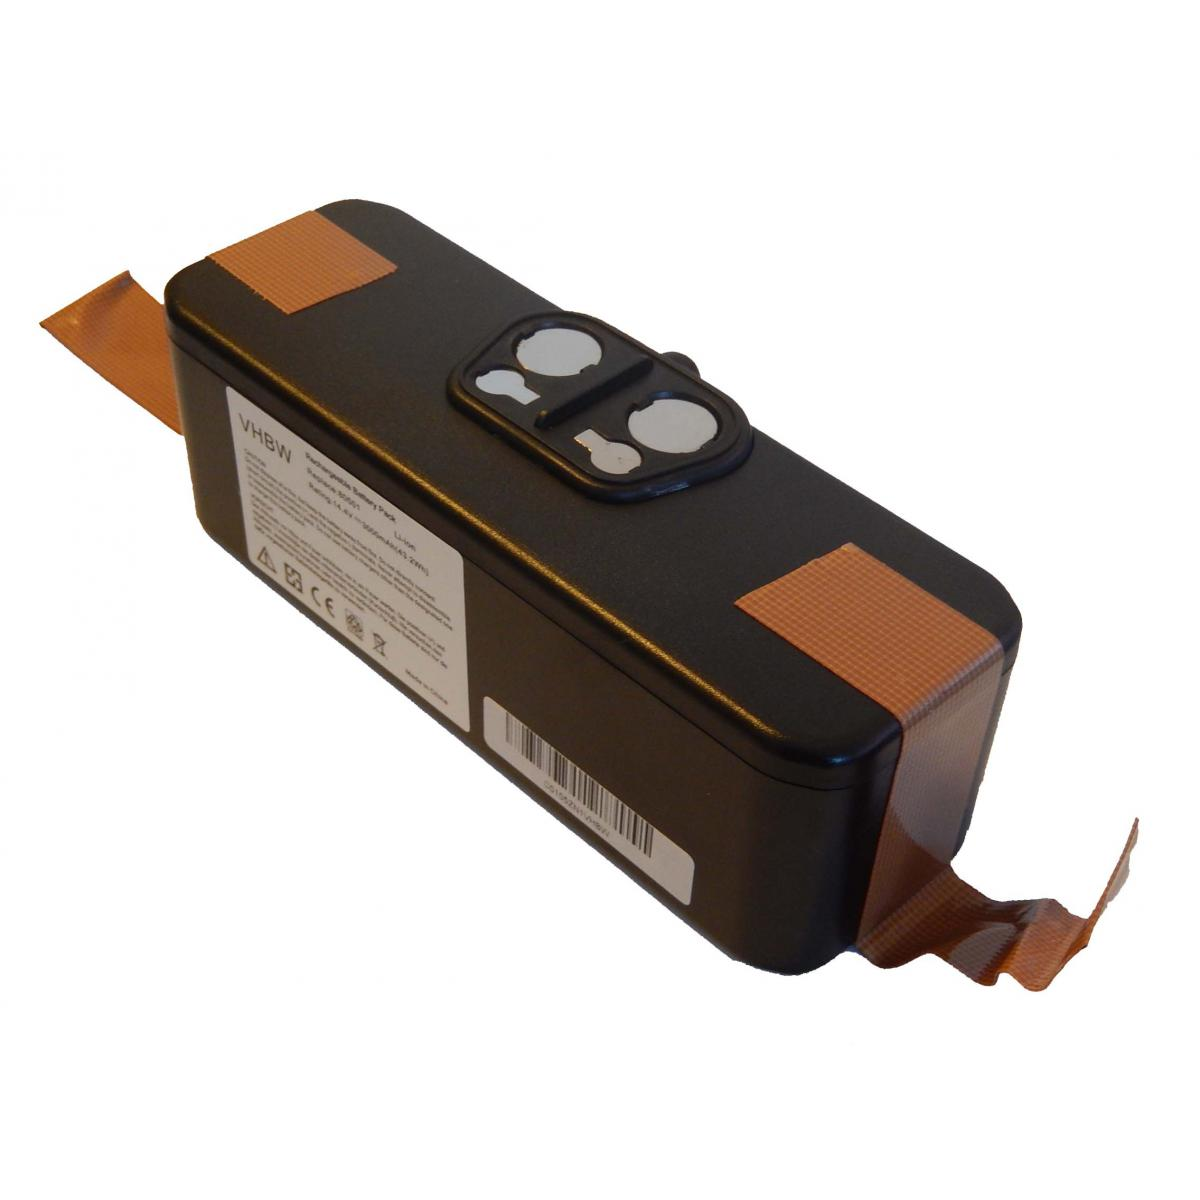 Vhbw vhbw® batterie de rechange Li-Ion 3000mAh (14.4V) compatible avec iRobot Roomba séries 500, 600, 700, 800, 900